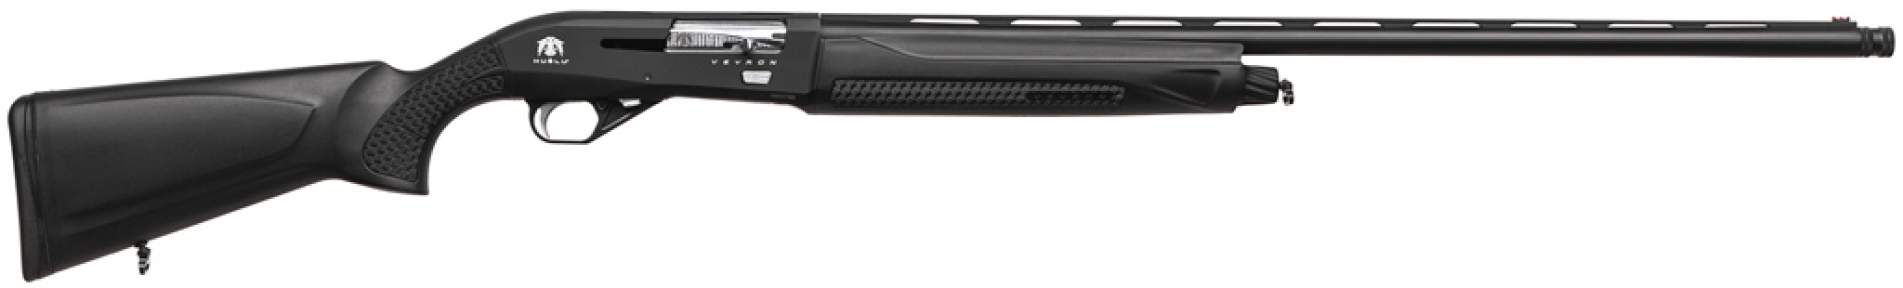 Ружье Huglu Veyron Black Synthetic кал. 12/76